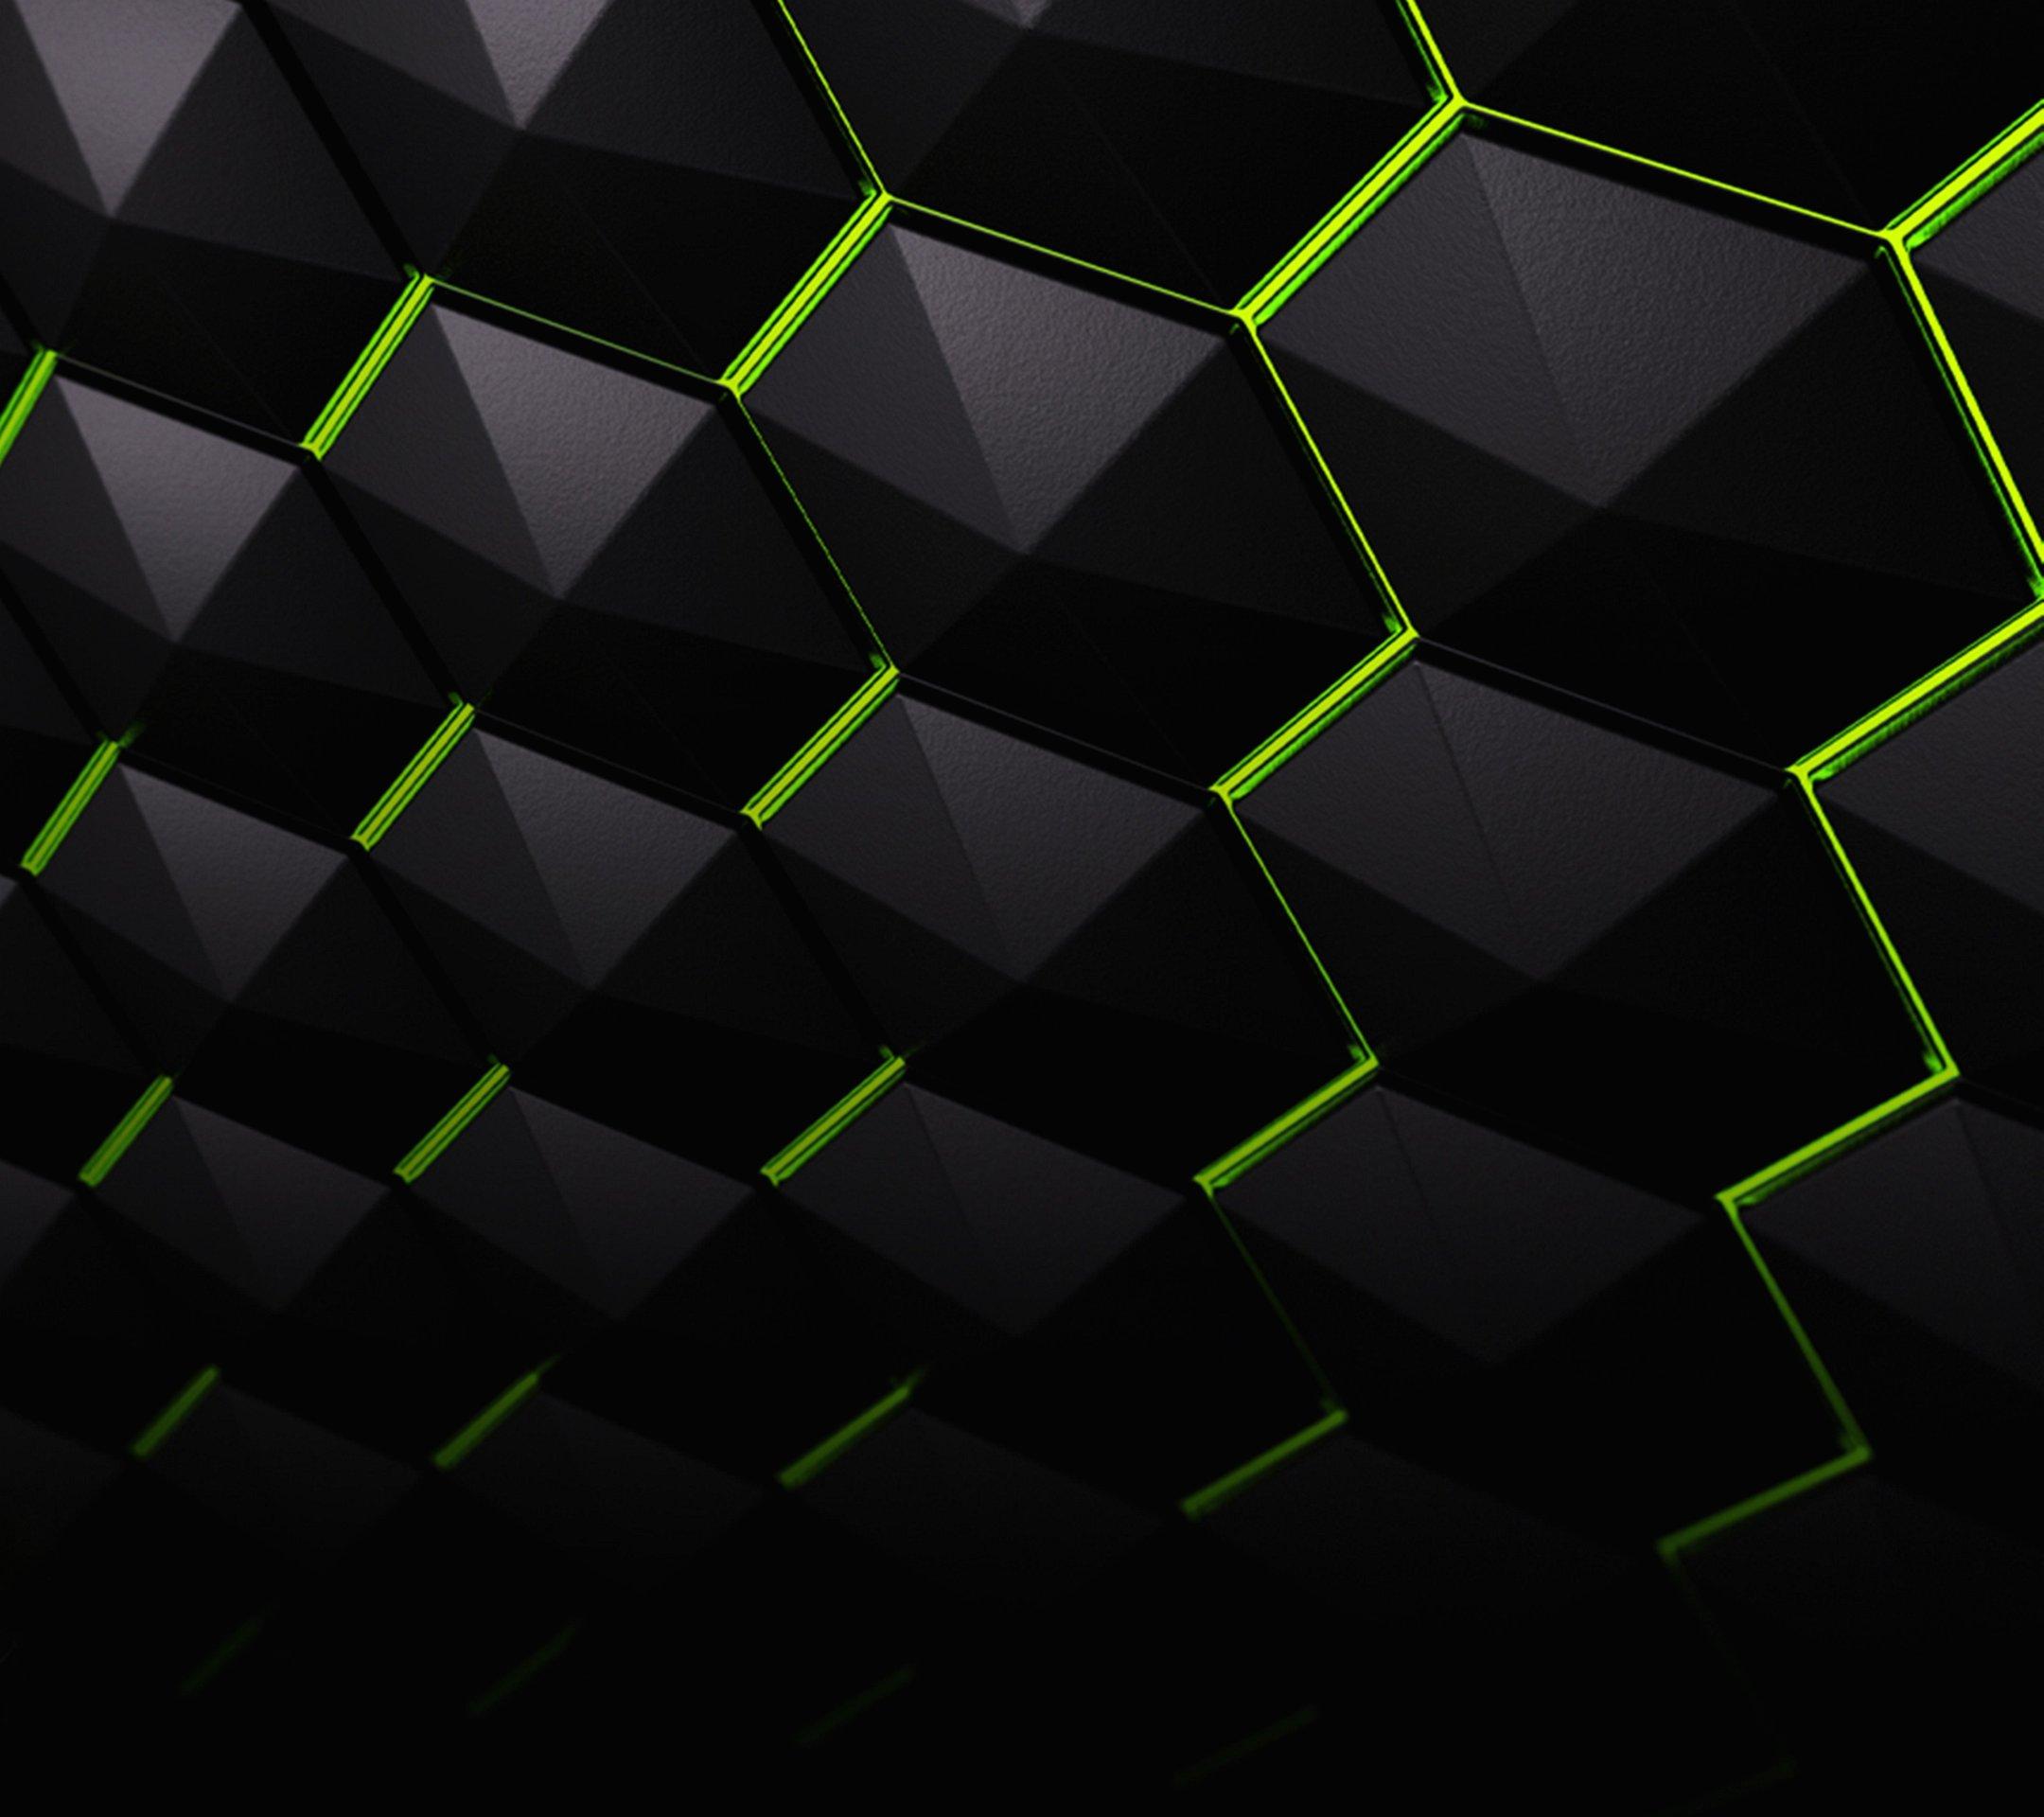 Evga Wallpaper: NVIDIA GeForce Wallpaper